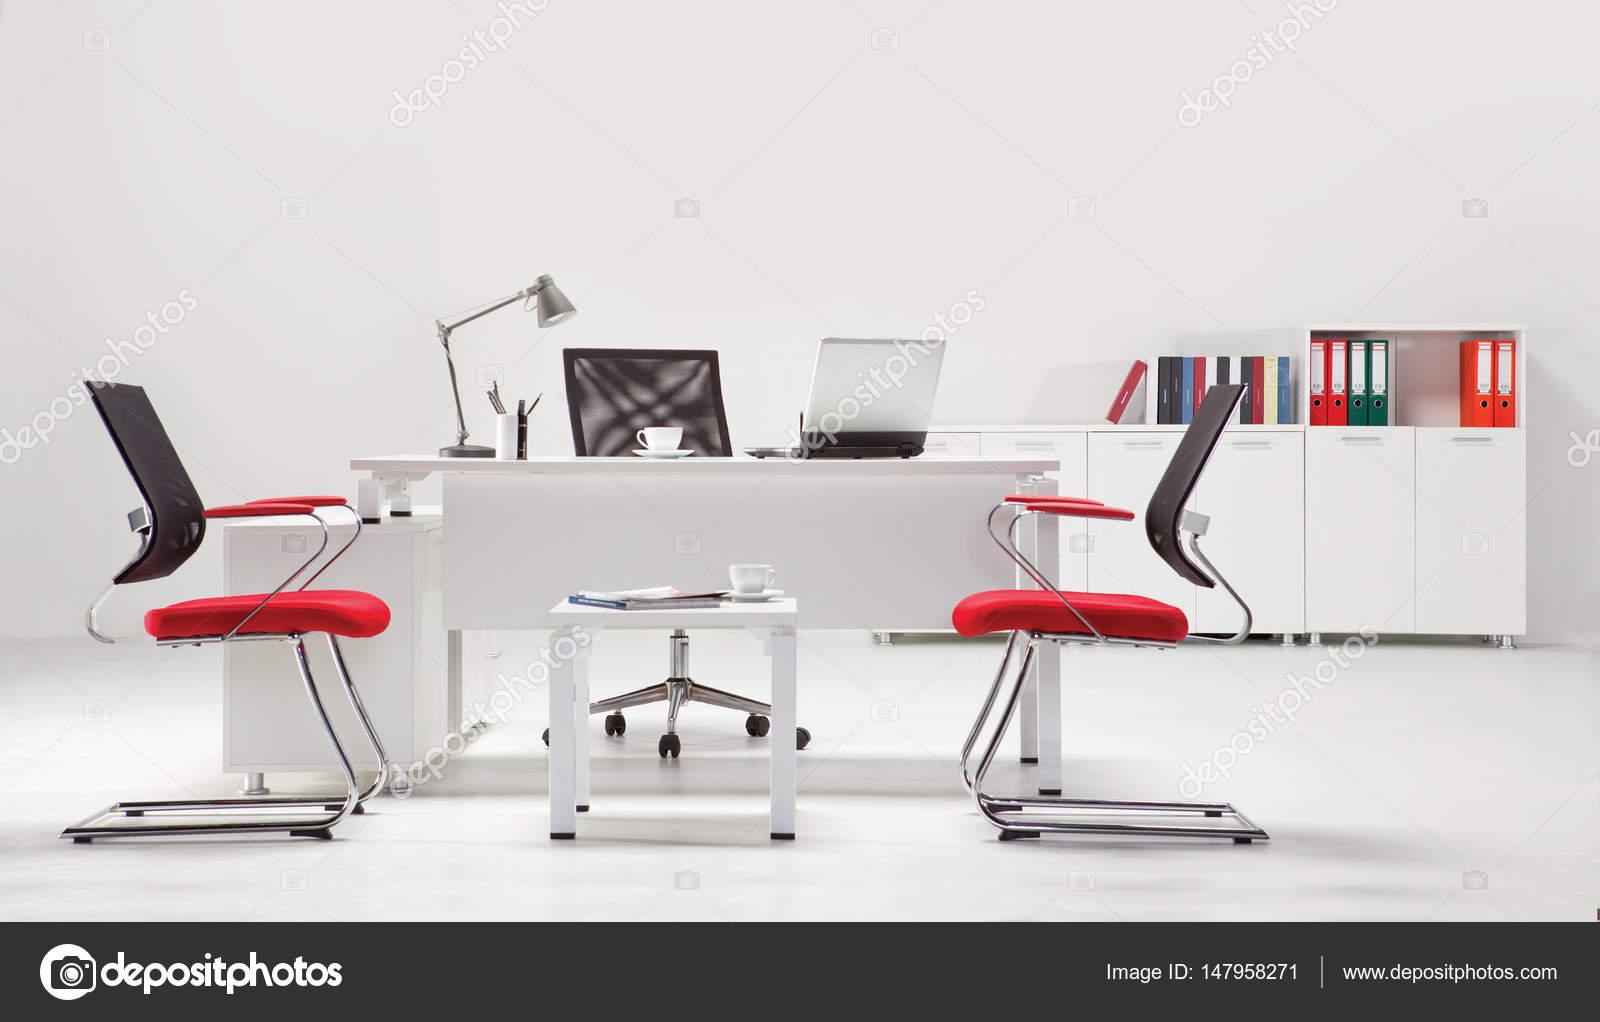 Mobili Per Ufficio Su : Mobili per ufficio per manager u foto stock yoska